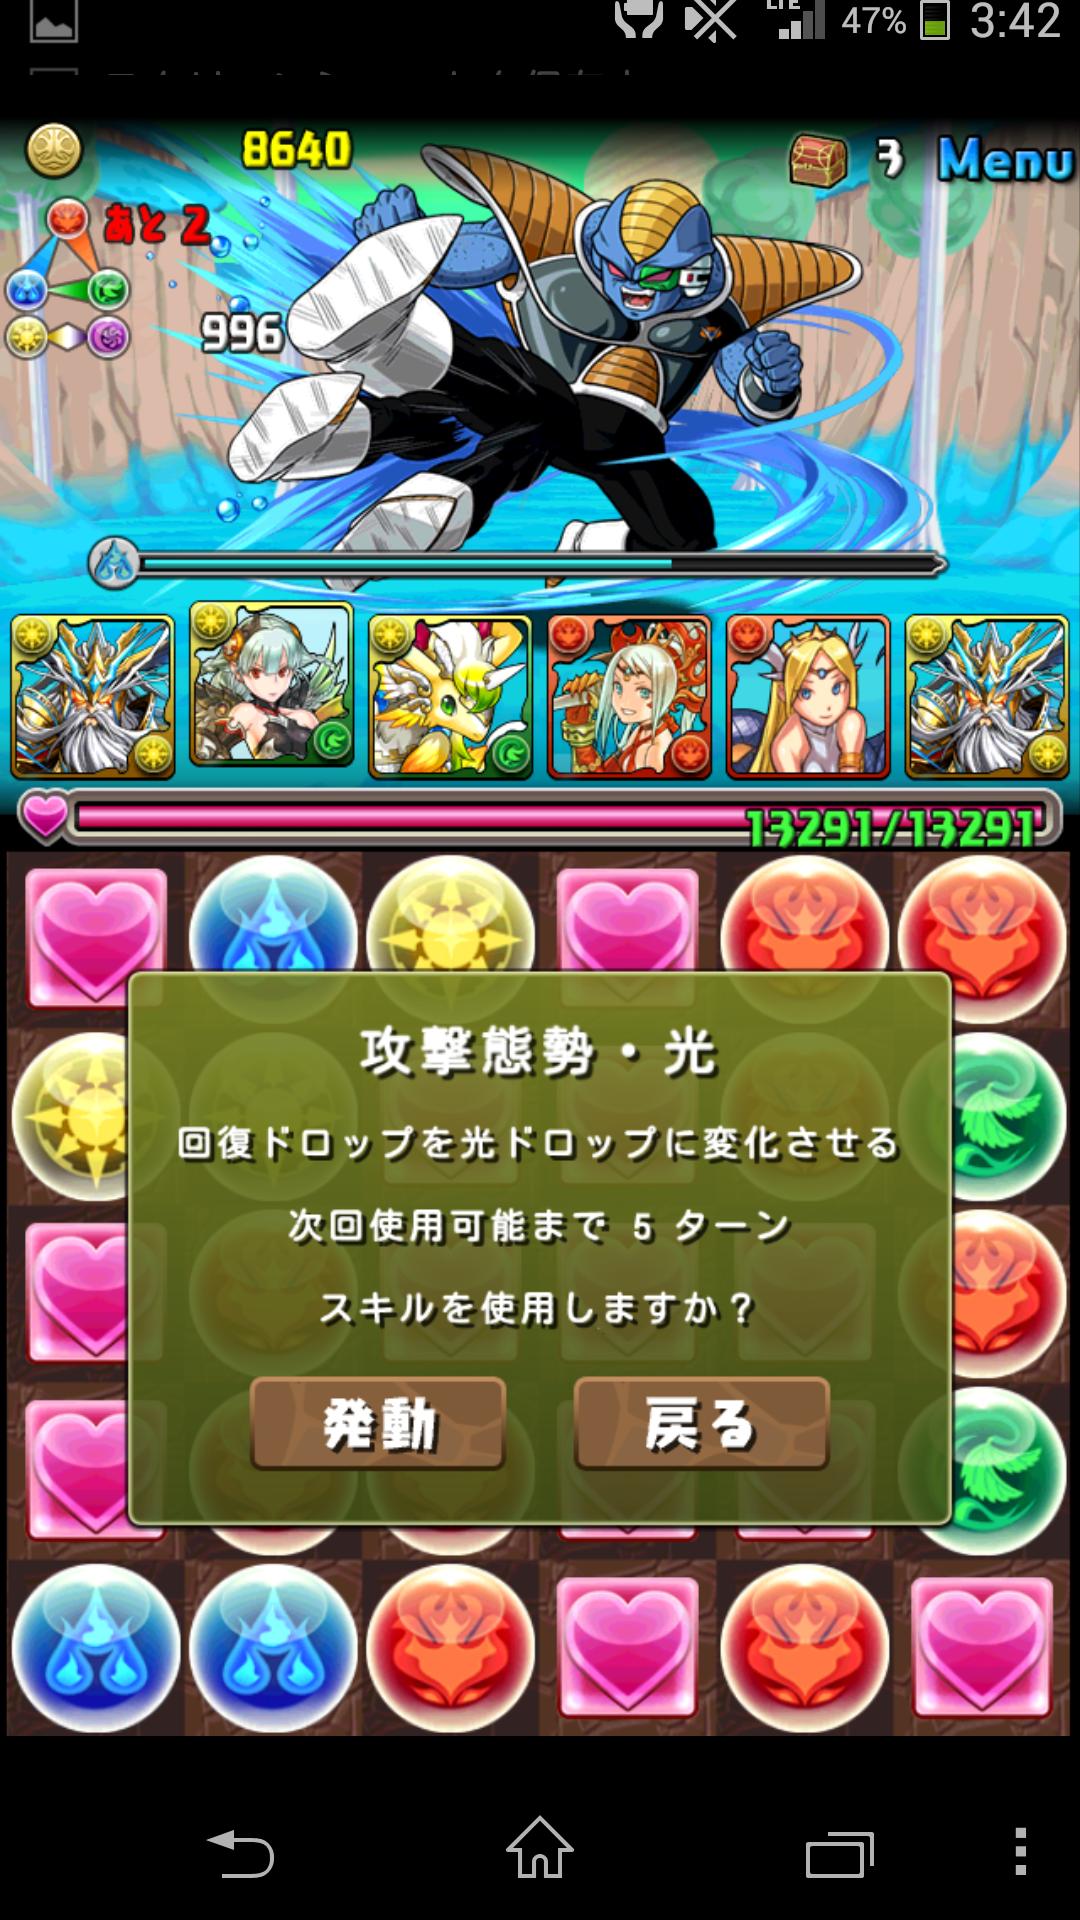 Screenshot_2014-06-06-03-42-14.png